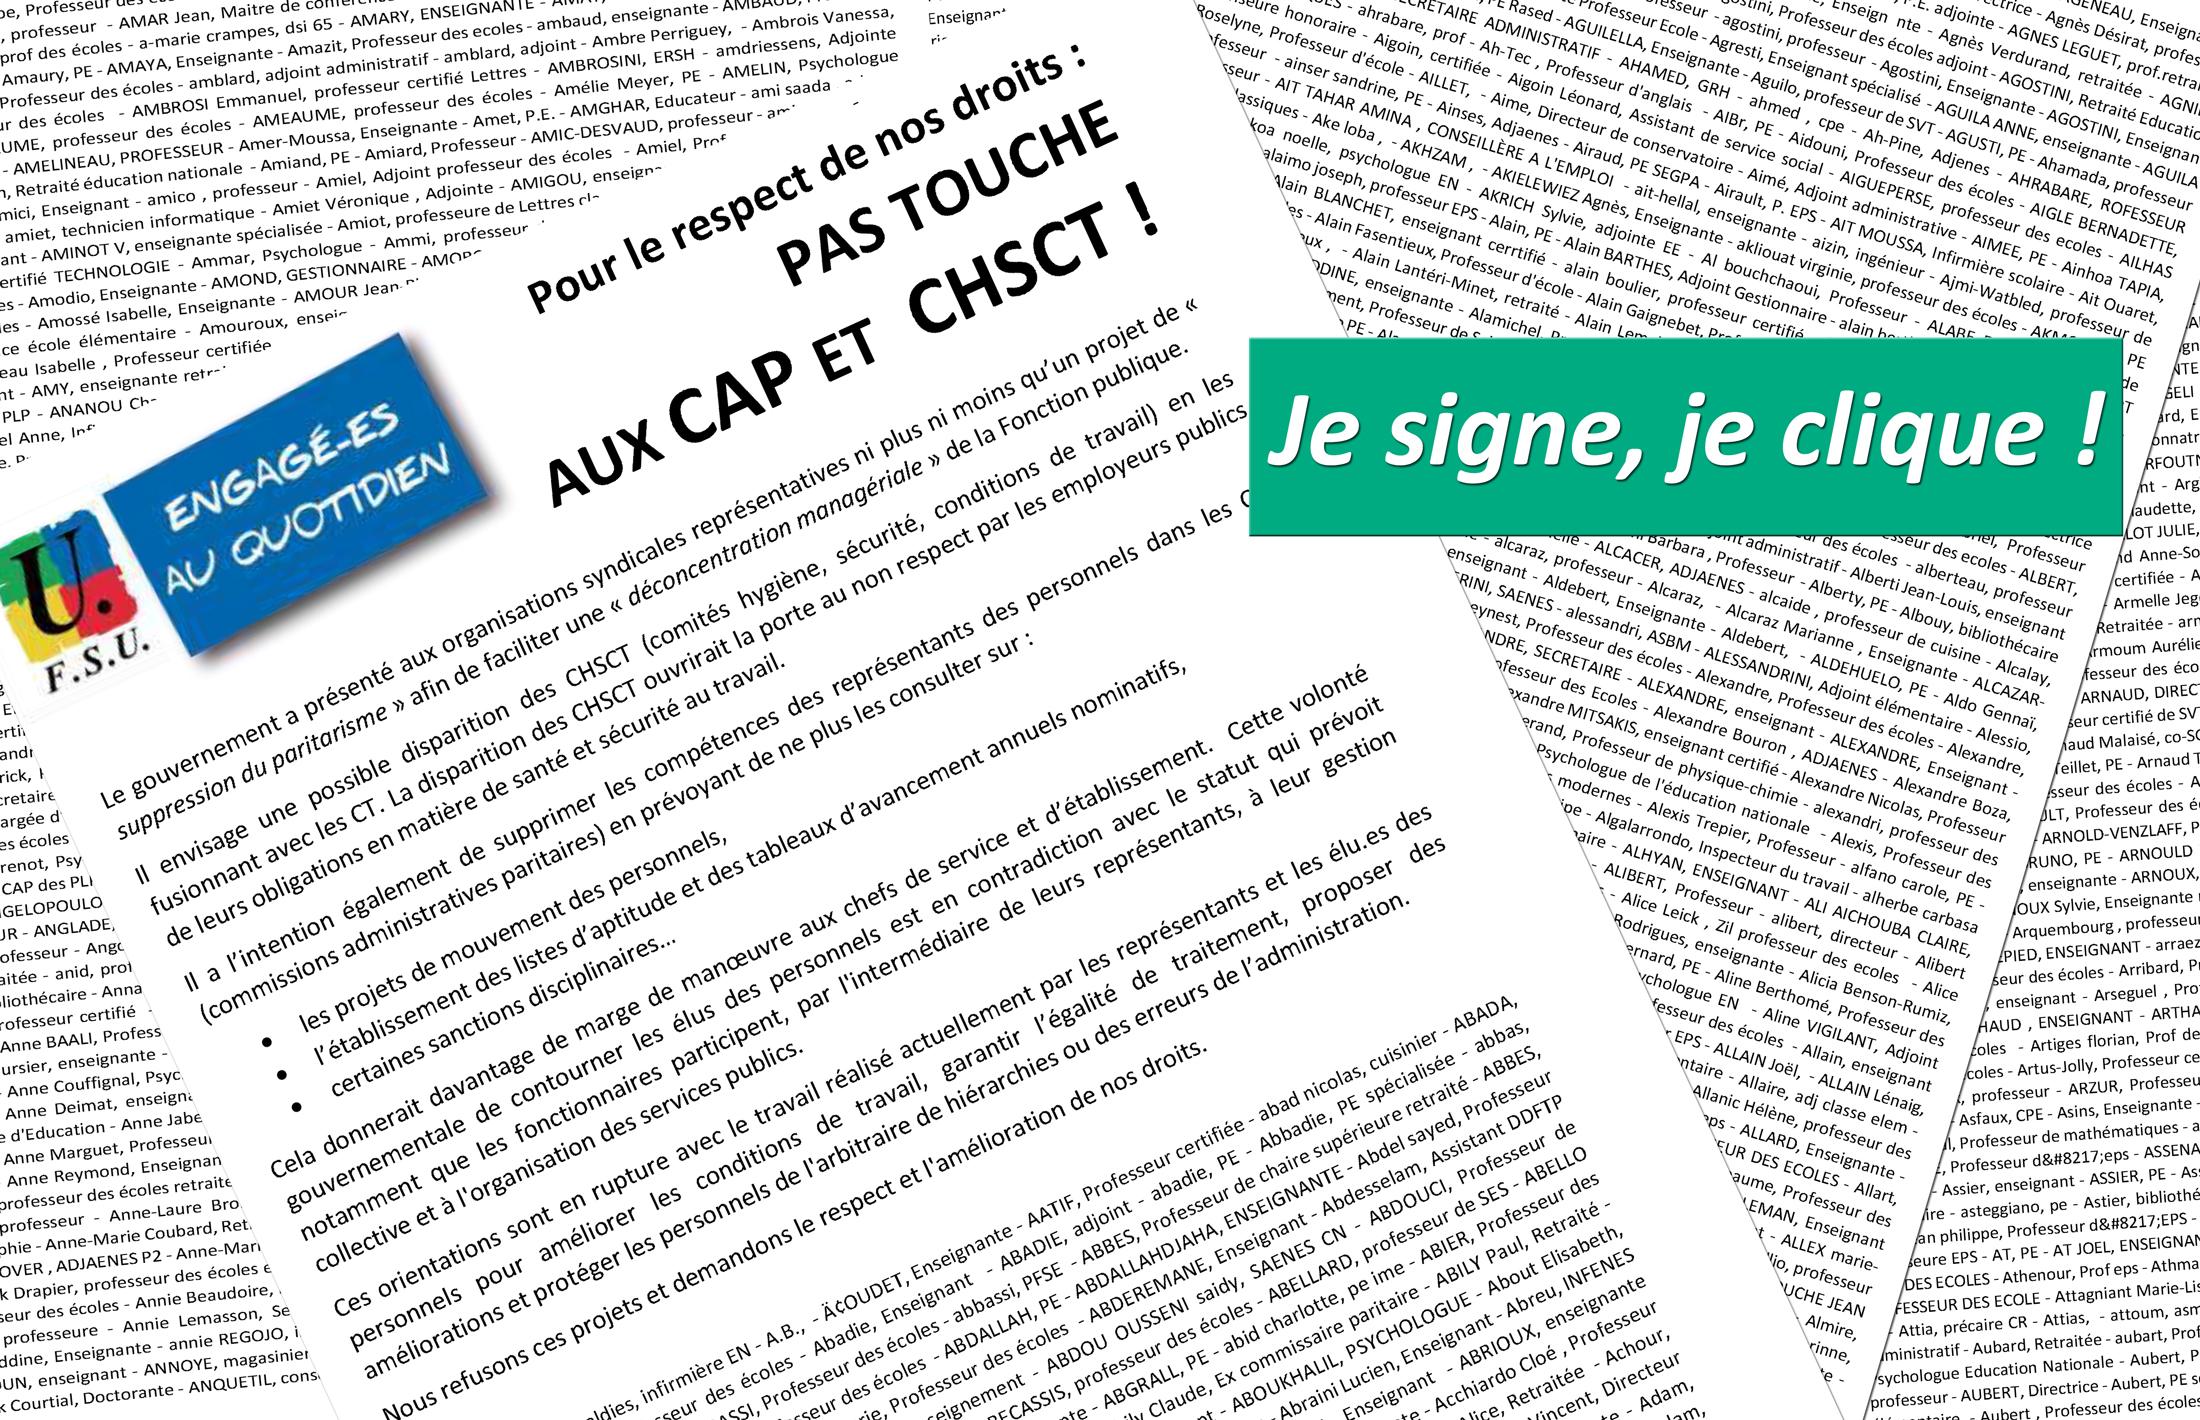 petition-chs-cap.jpg